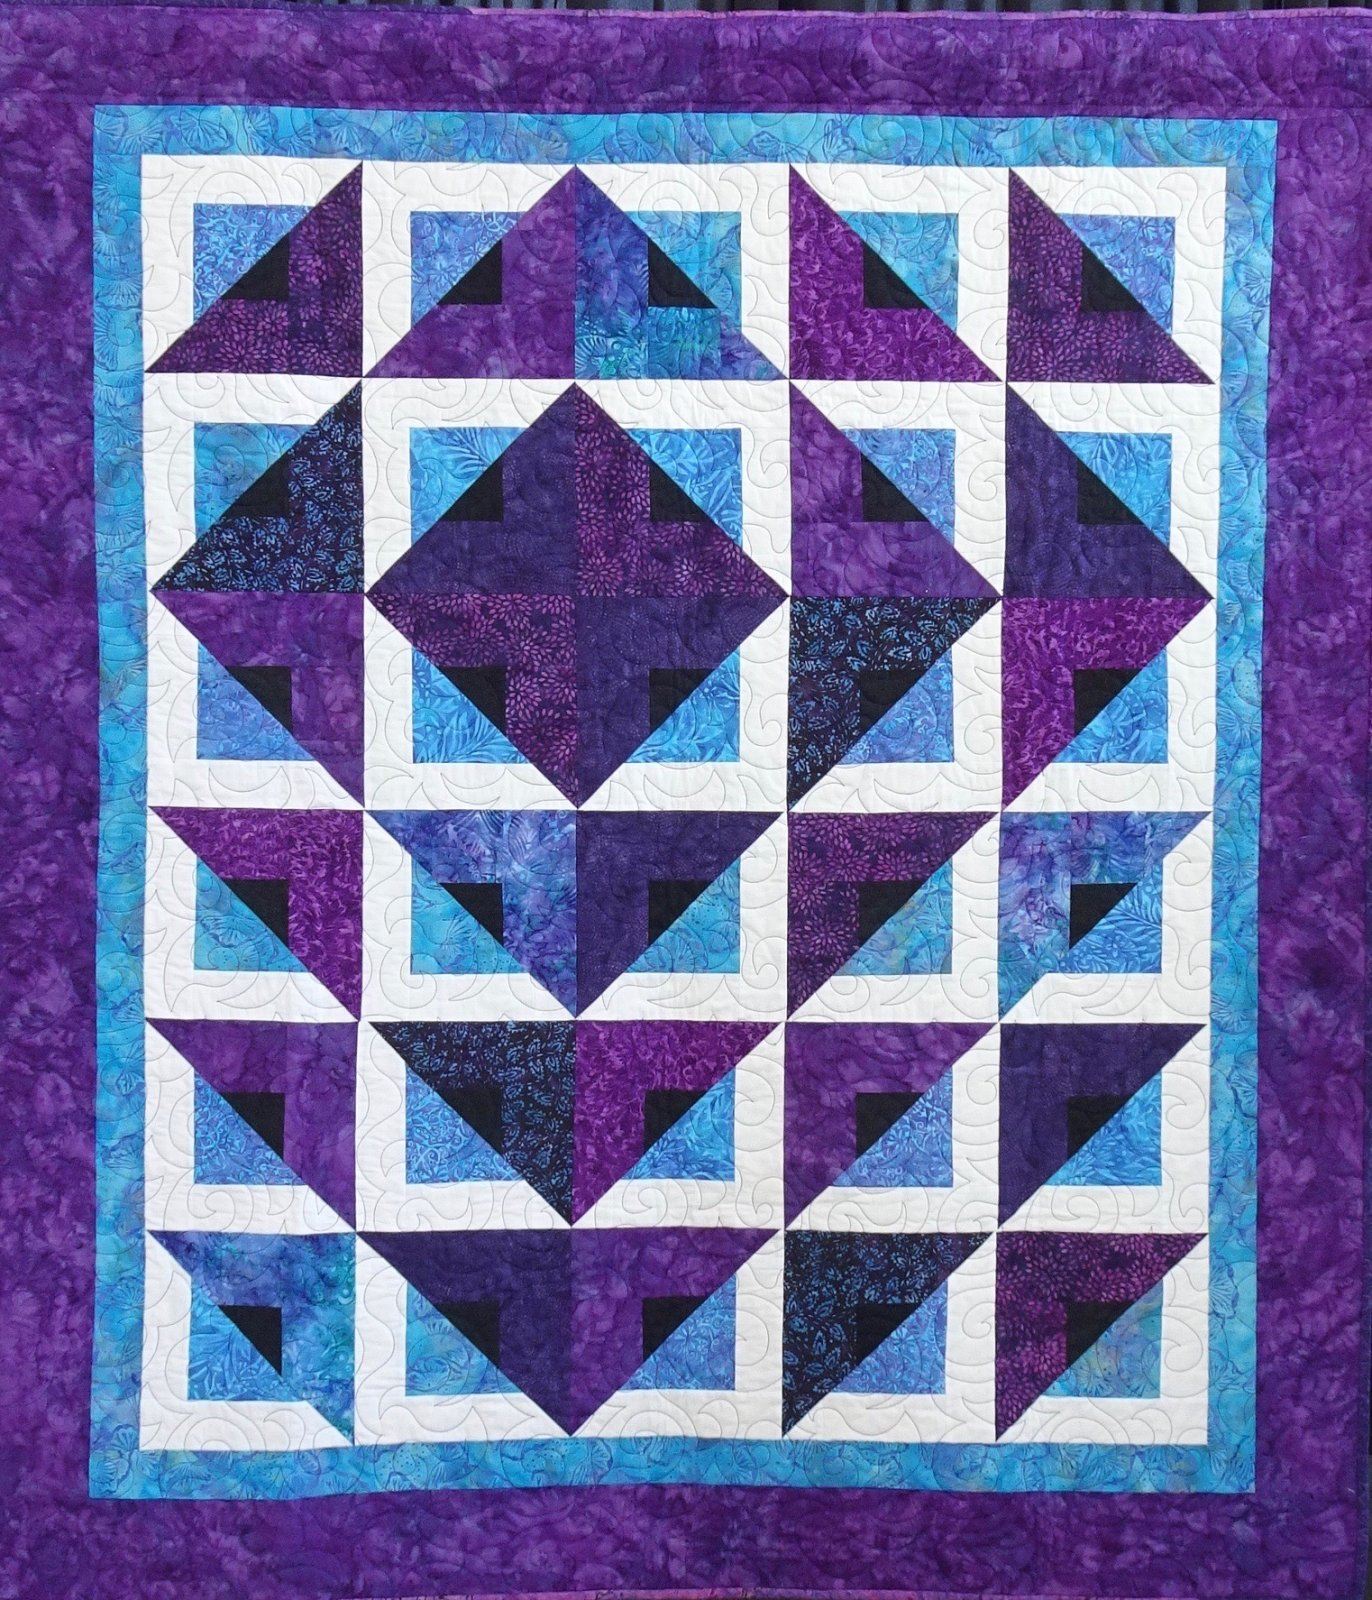 22-047 Passion for Purple